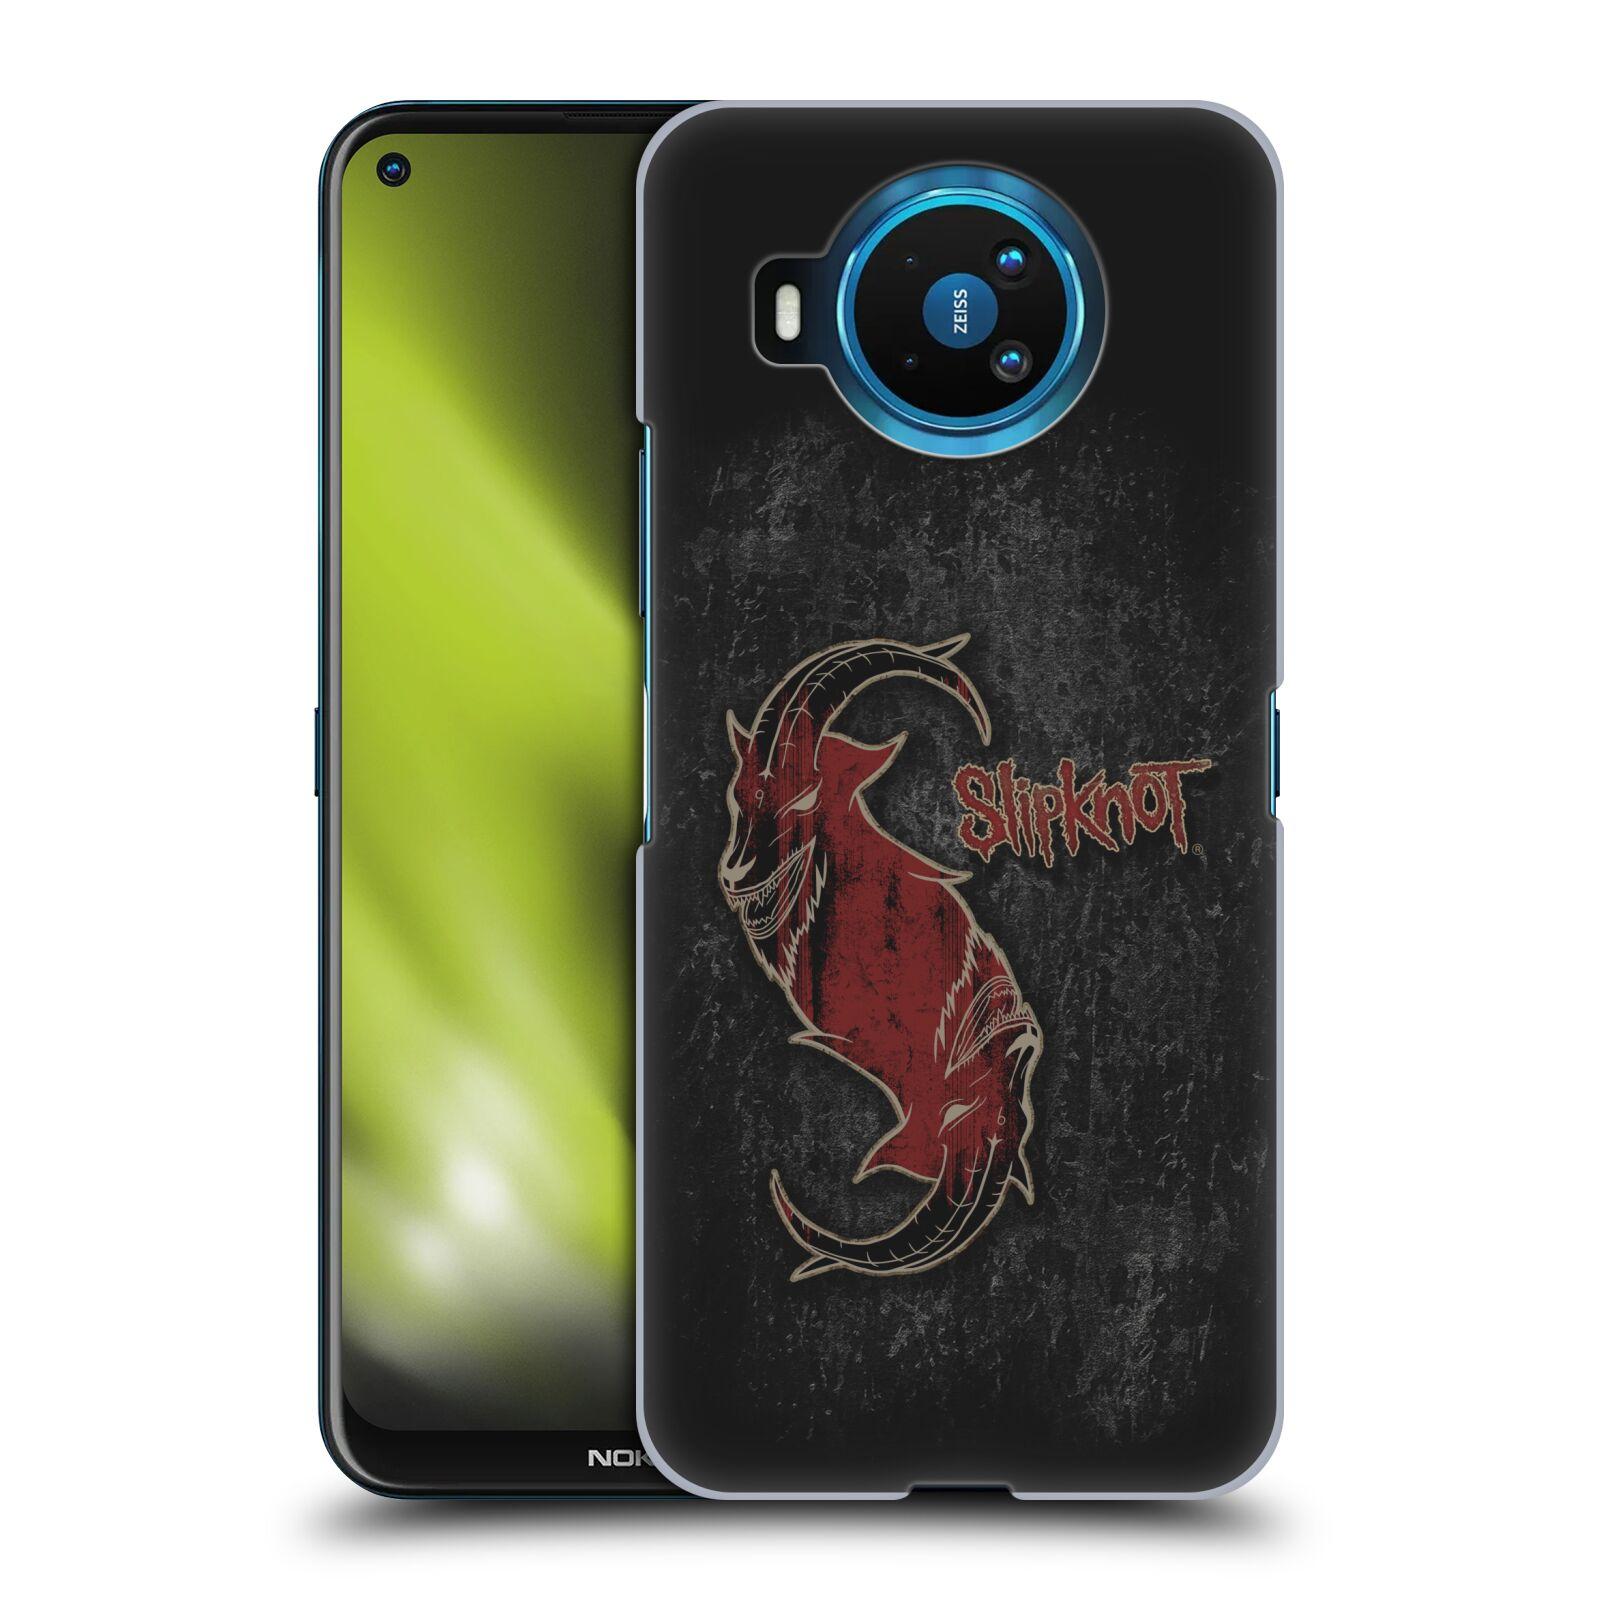 Plastové pouzdro na mobil Nokia 8.3 5G - Head Case - Slipknot - Rudý kozel